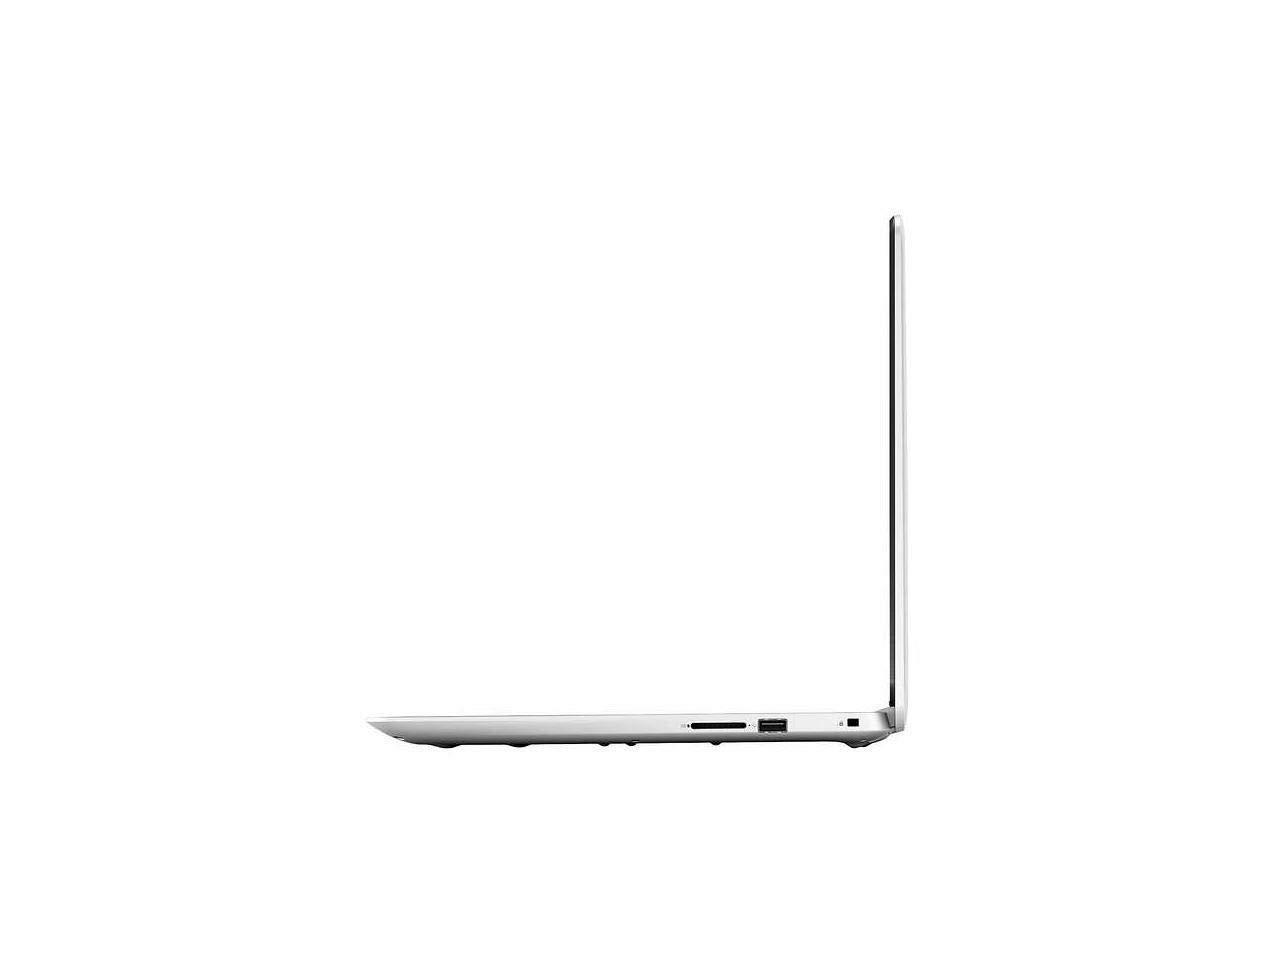 "Dell Inspiron 15 5000, 2019 15.6"" FHD Touchscreen Laptop, Intel 4-Core i5-8265U, 12GB RAM, 256GB PCIe SSD by 16GB Optane, 1TB HDD, Backlit KB Fingerprint Reader MaxxAudio Win 10/Accessories Bundle 4"